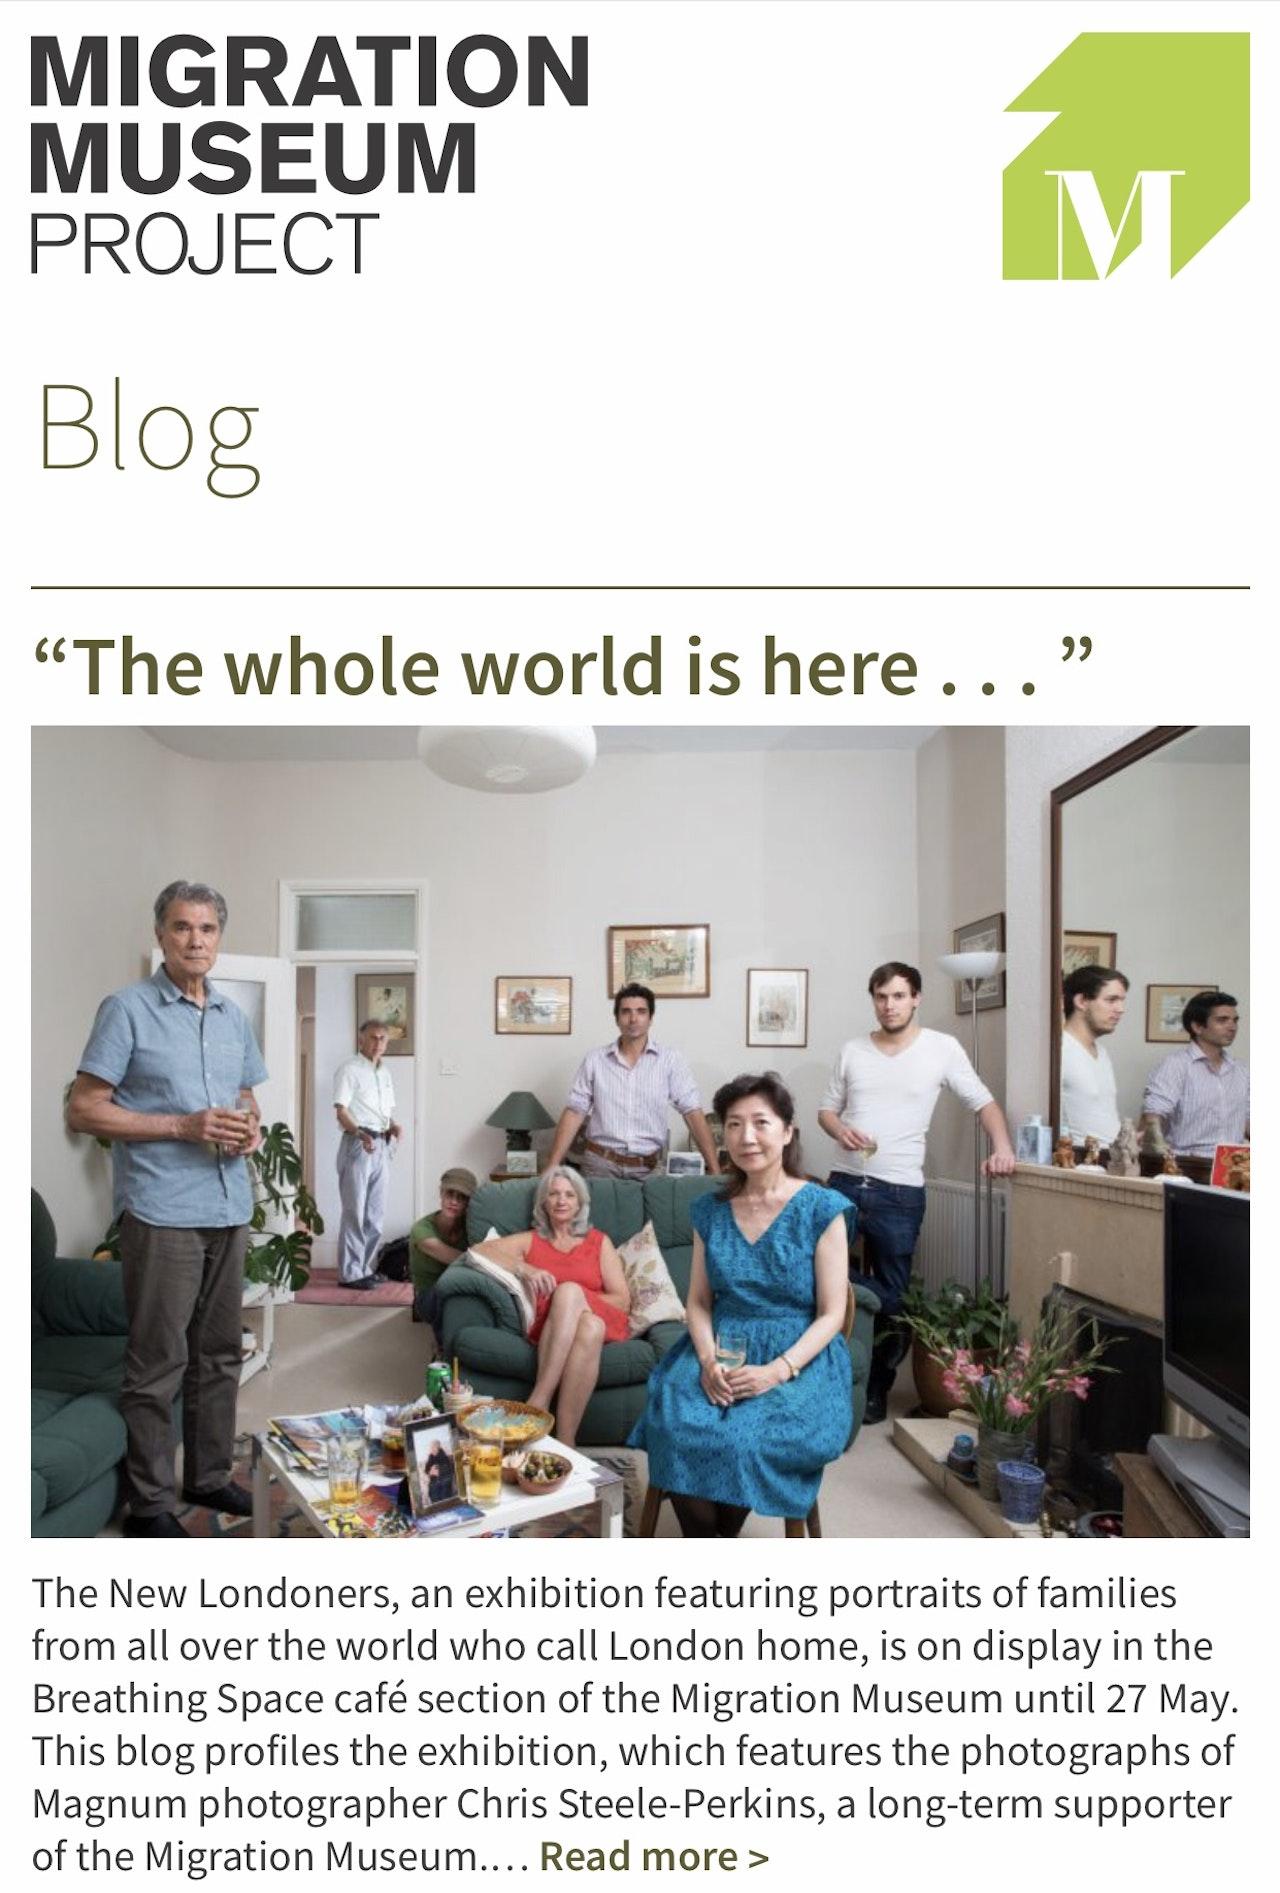 Migration Museum Blog